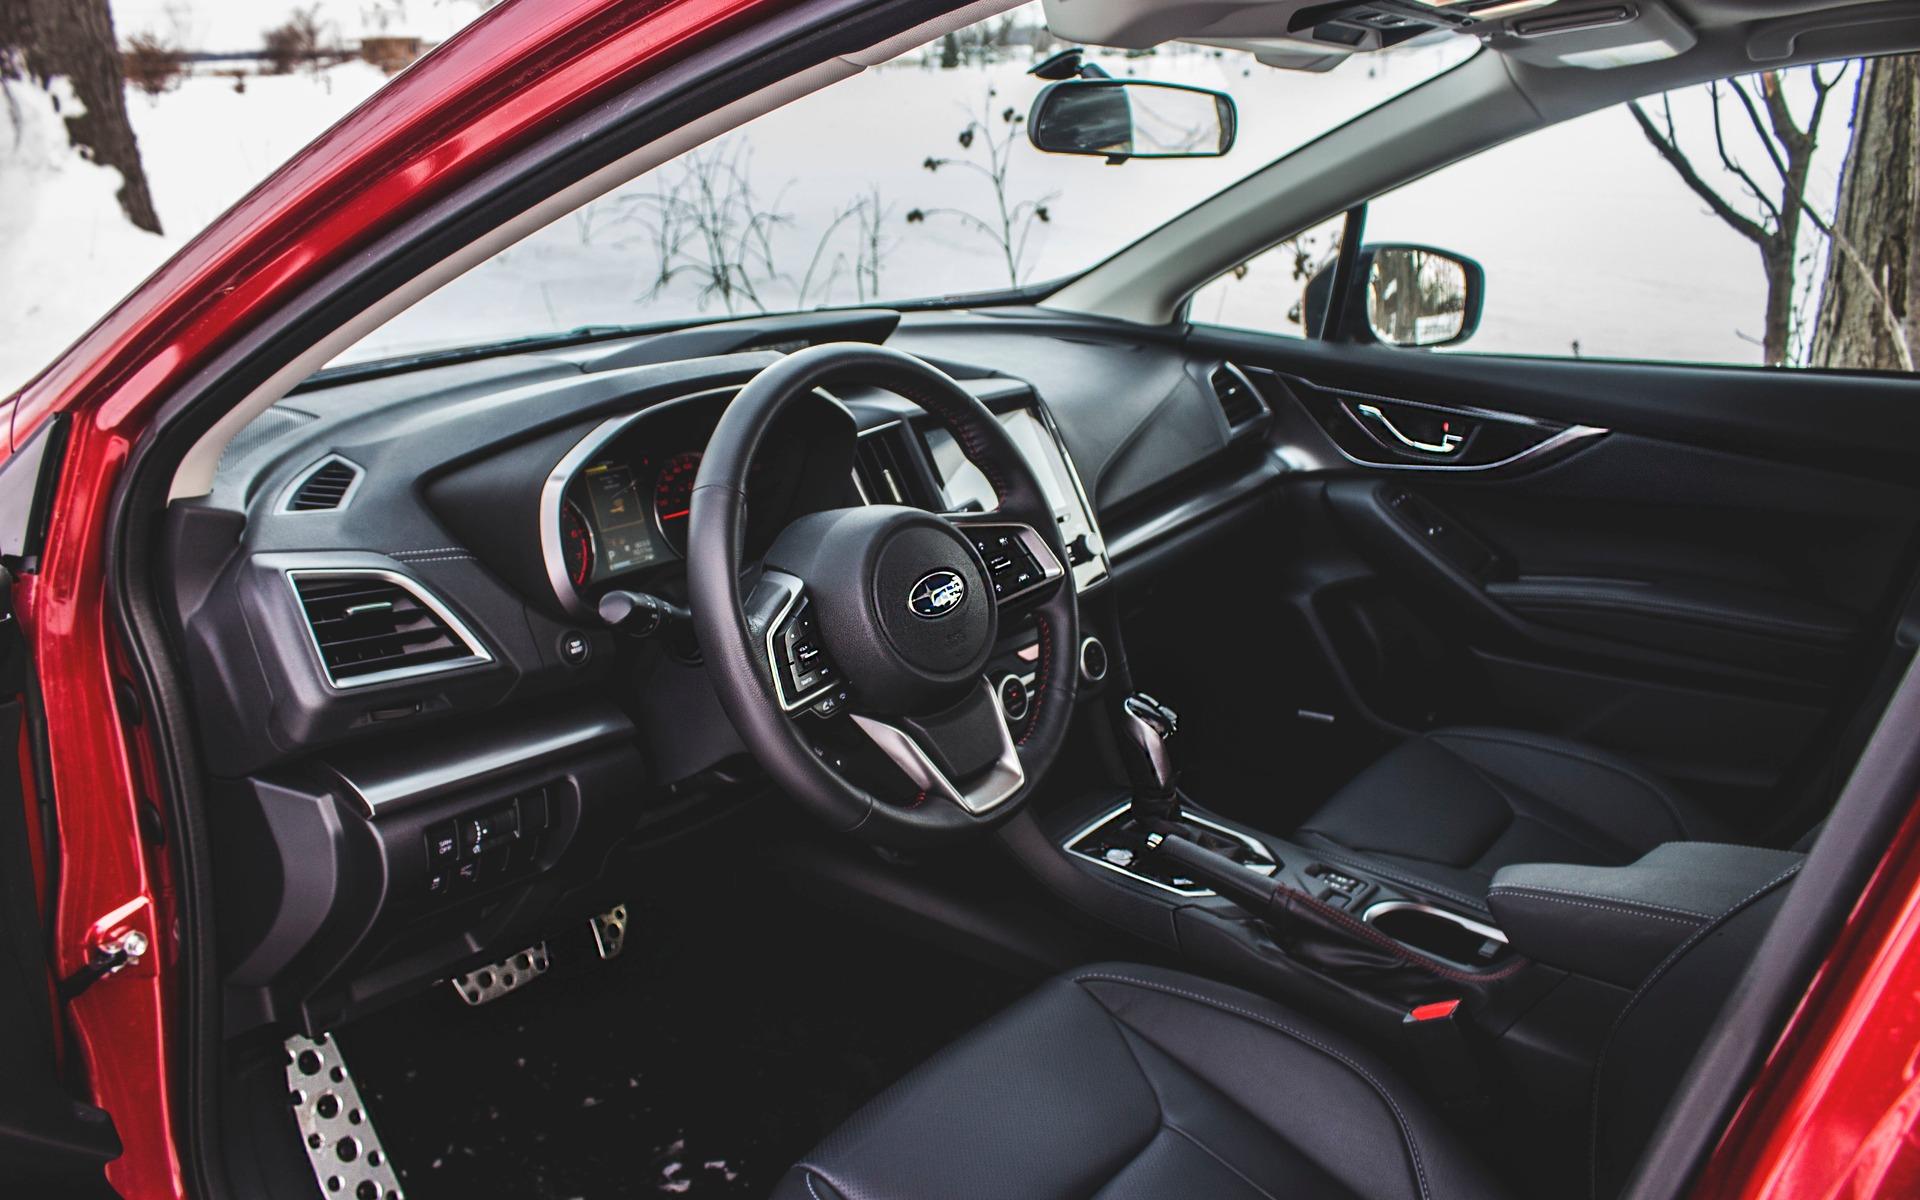 2018 Subaru Impreza: When Clark Kent Tries to Fit in - The Car Guide